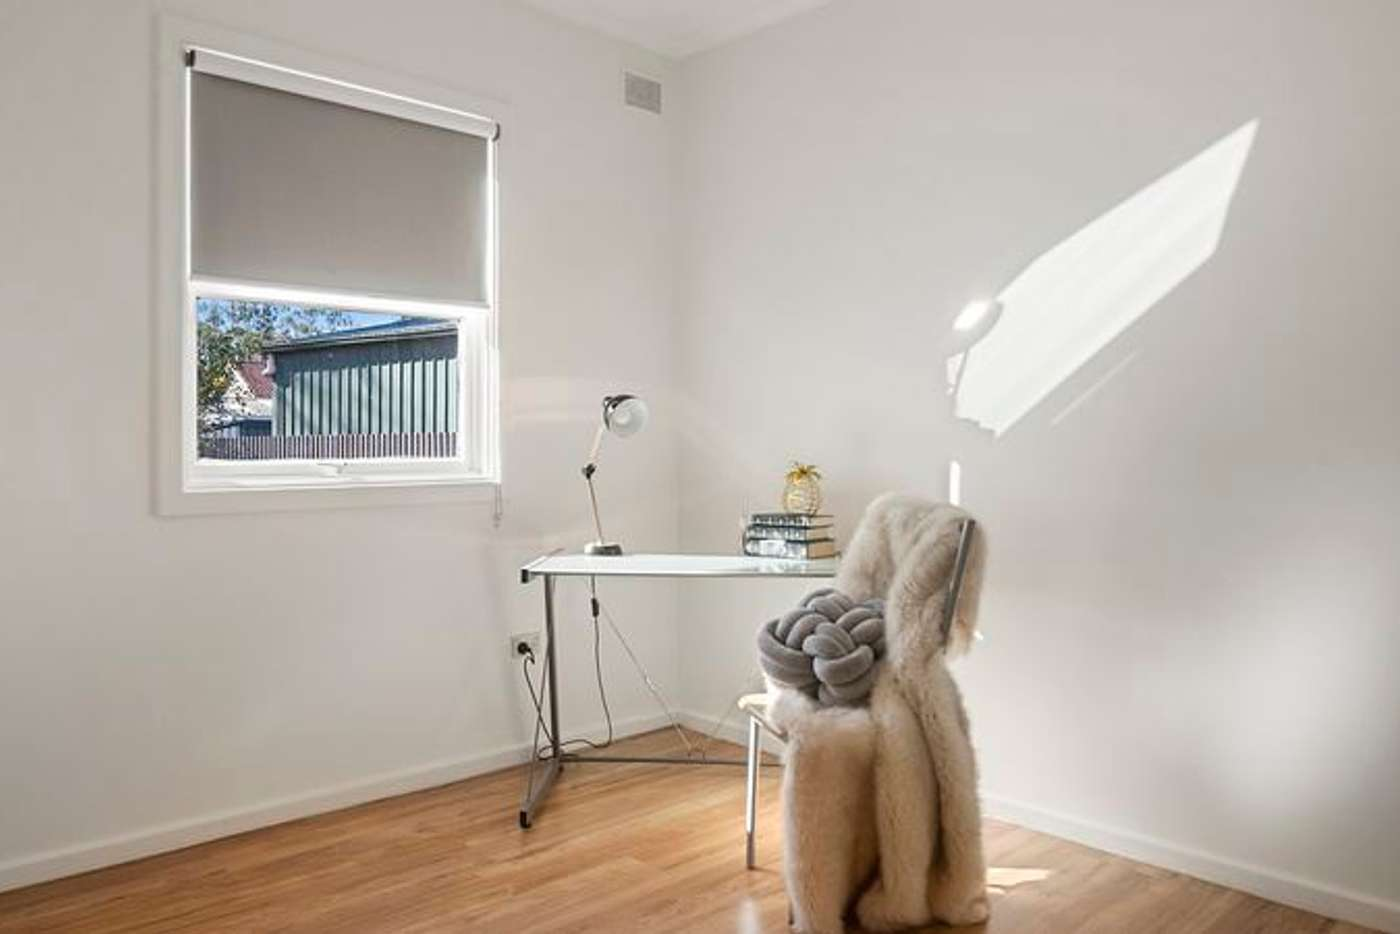 Seventh view of Homely house listing, 40 Ashton Road, Davoren Park SA 5113